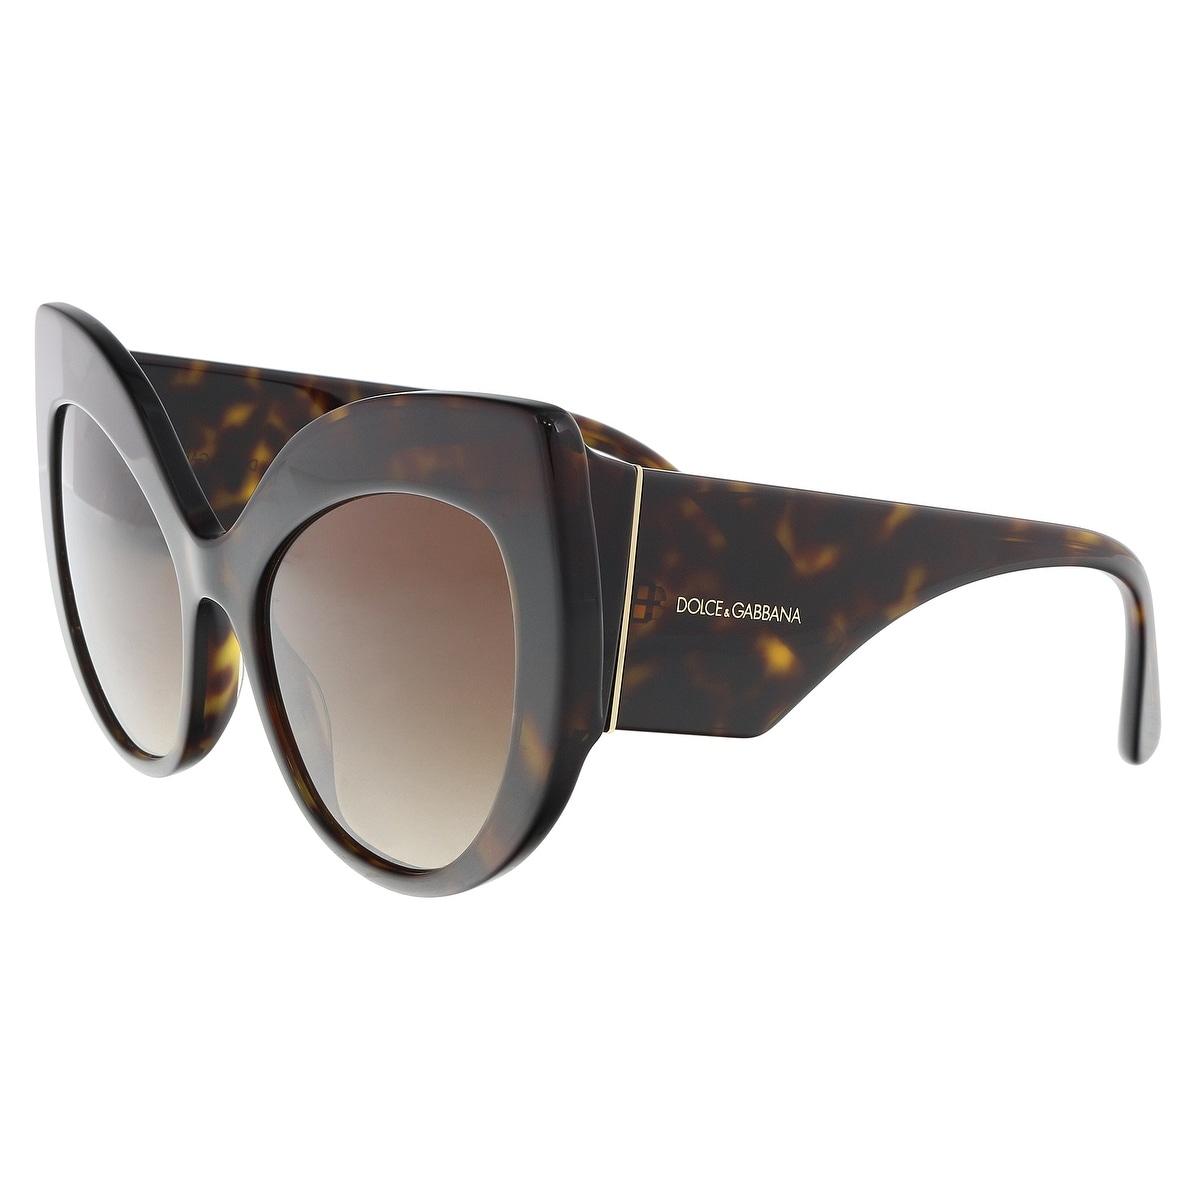 4ca19ada08 Dolce & Gabbana Women's Sunglasses | Find Great Sunglasses Deals Shopping  at Overstock